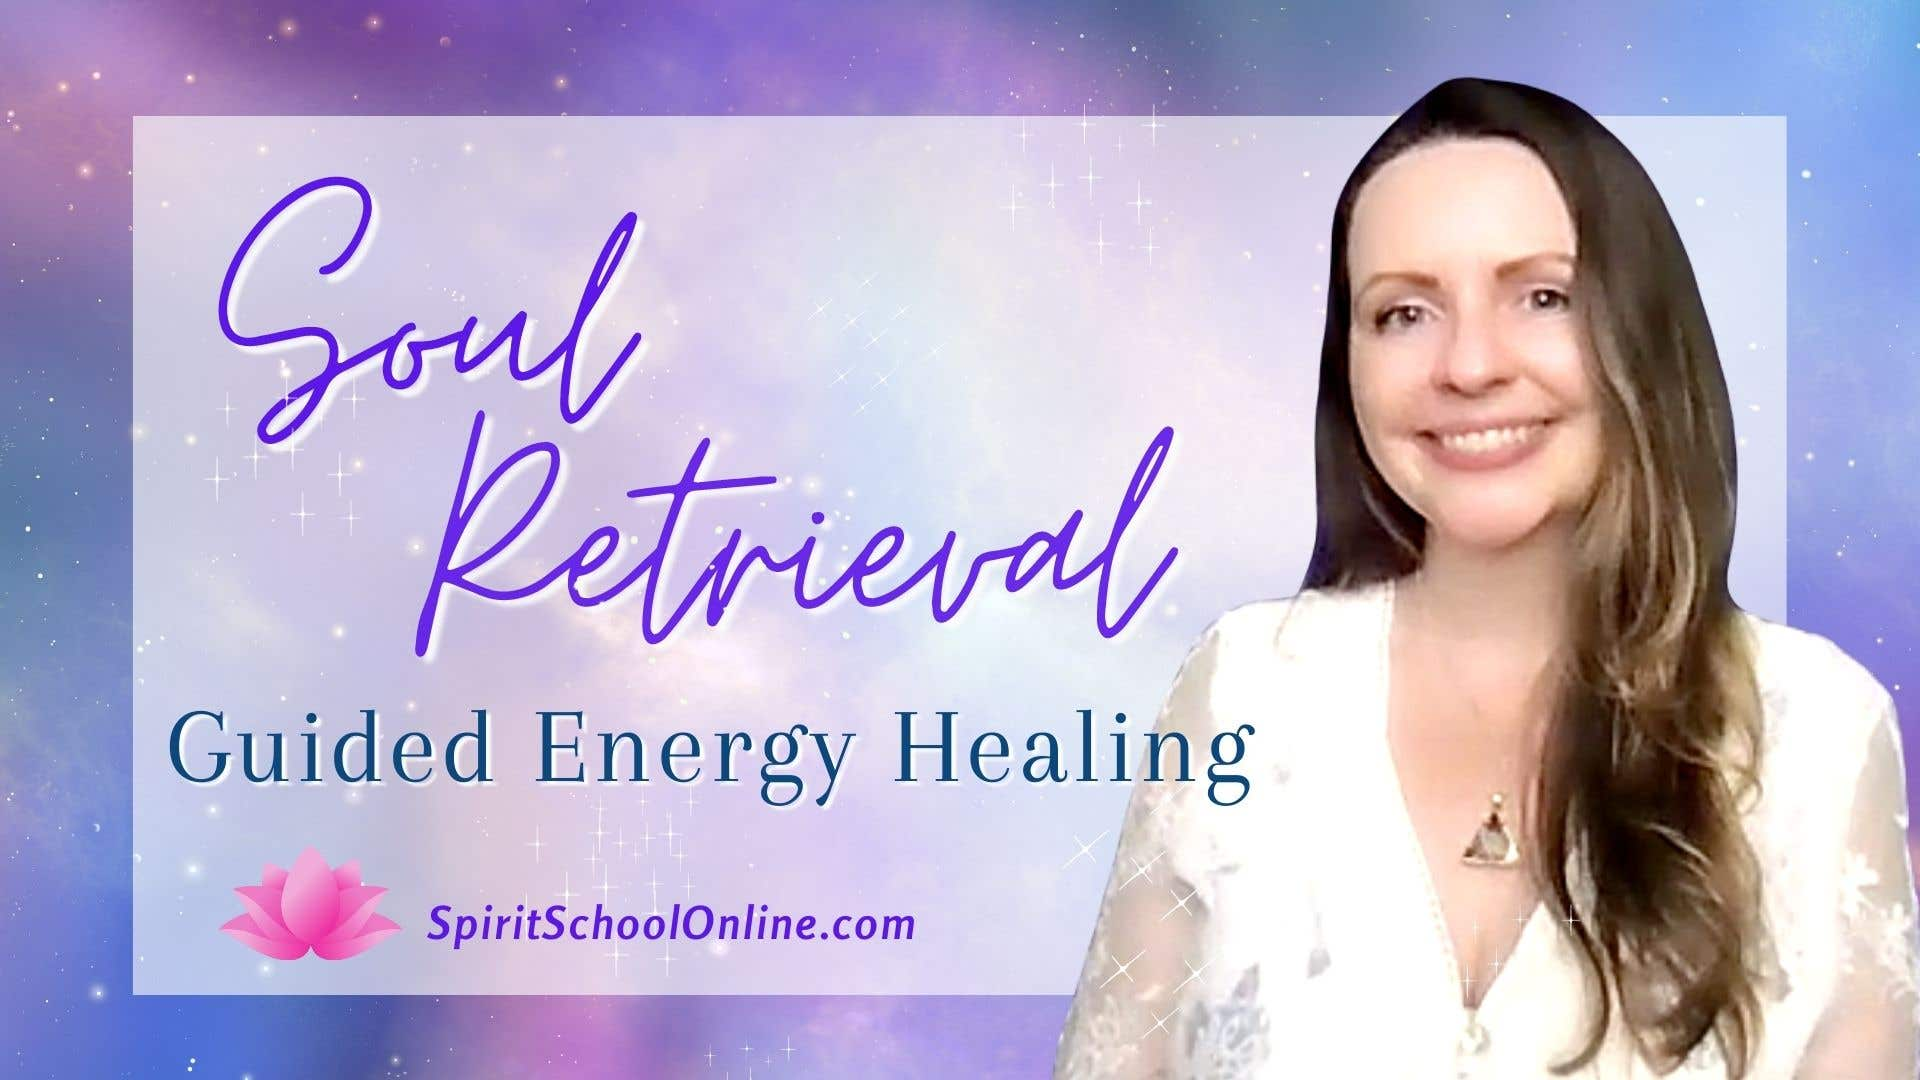 Guided Energy Healing Meditation